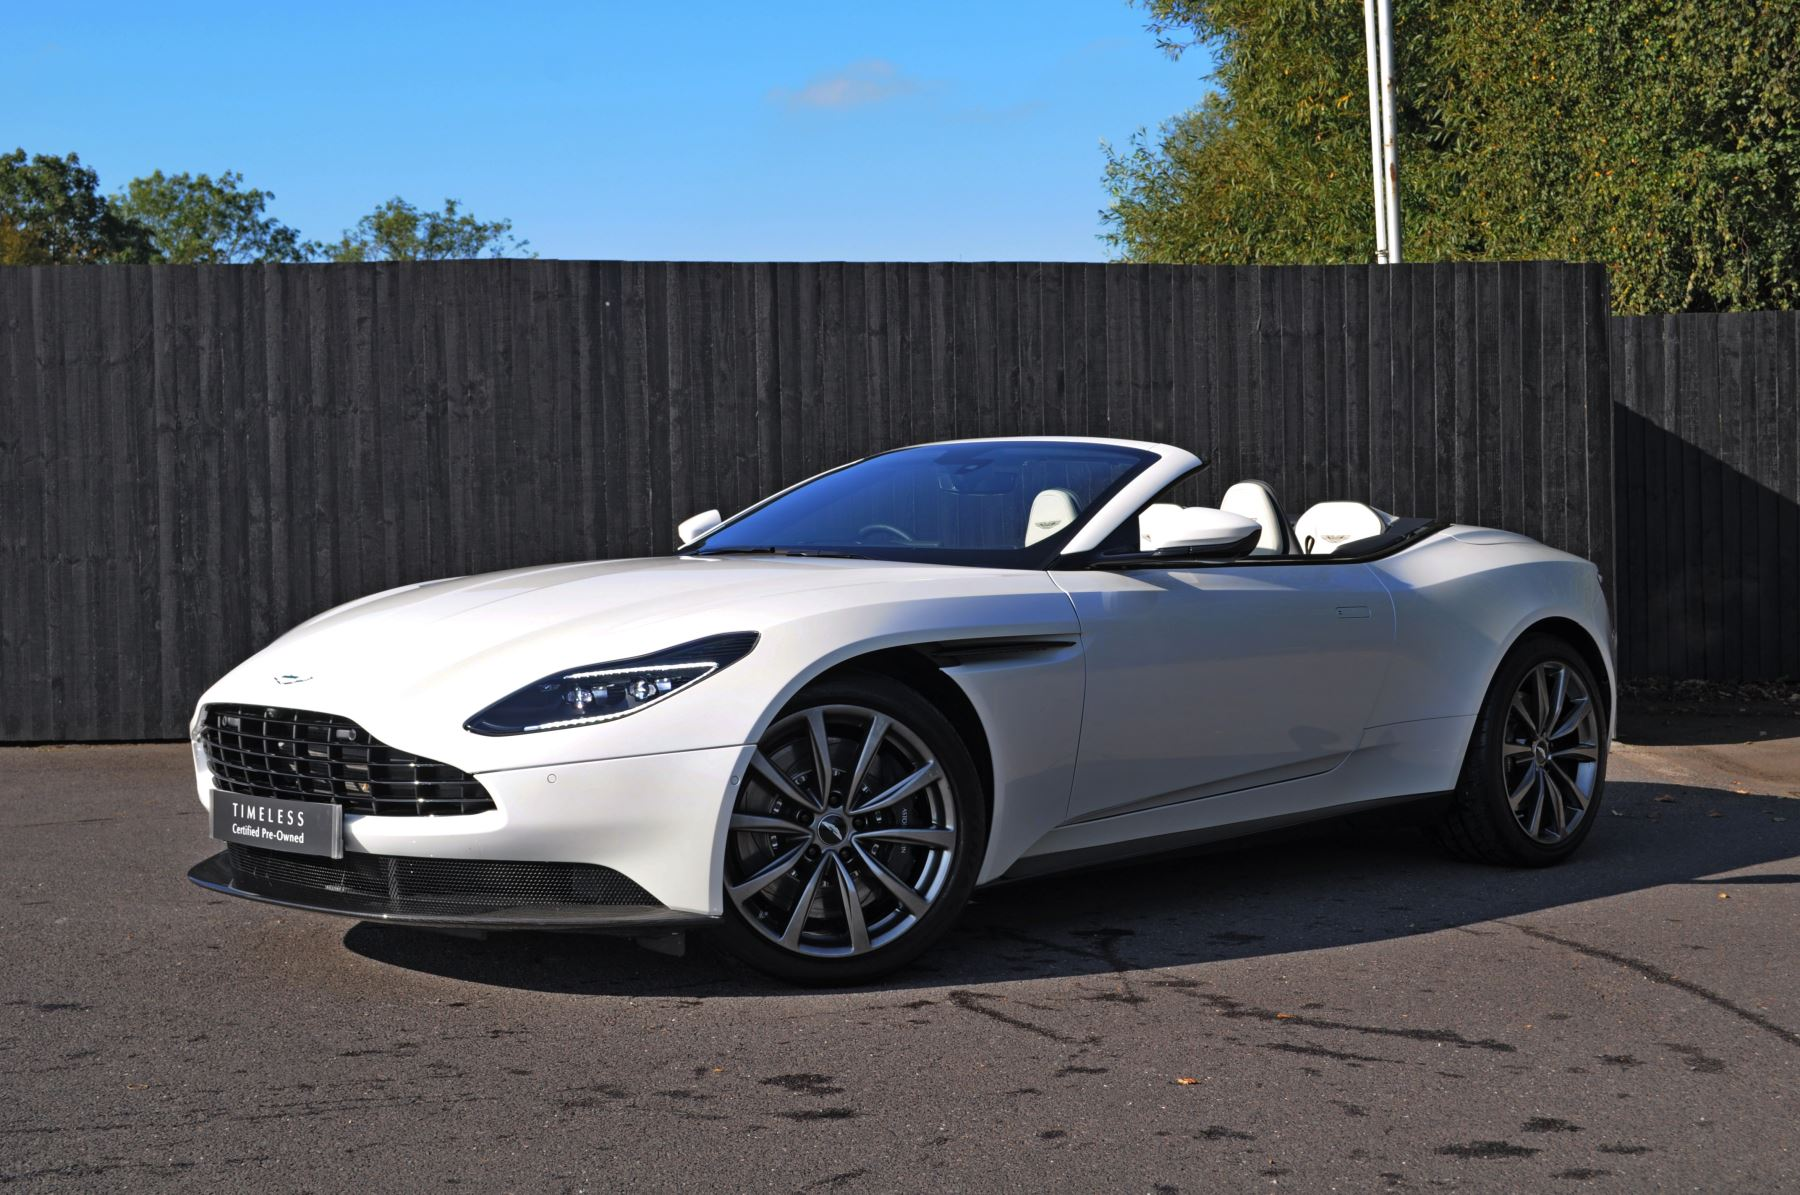 Aston Martin DB11 V8 Volante 2dr Touchtronic 4.0 Automatic Convertible (2019.5) image